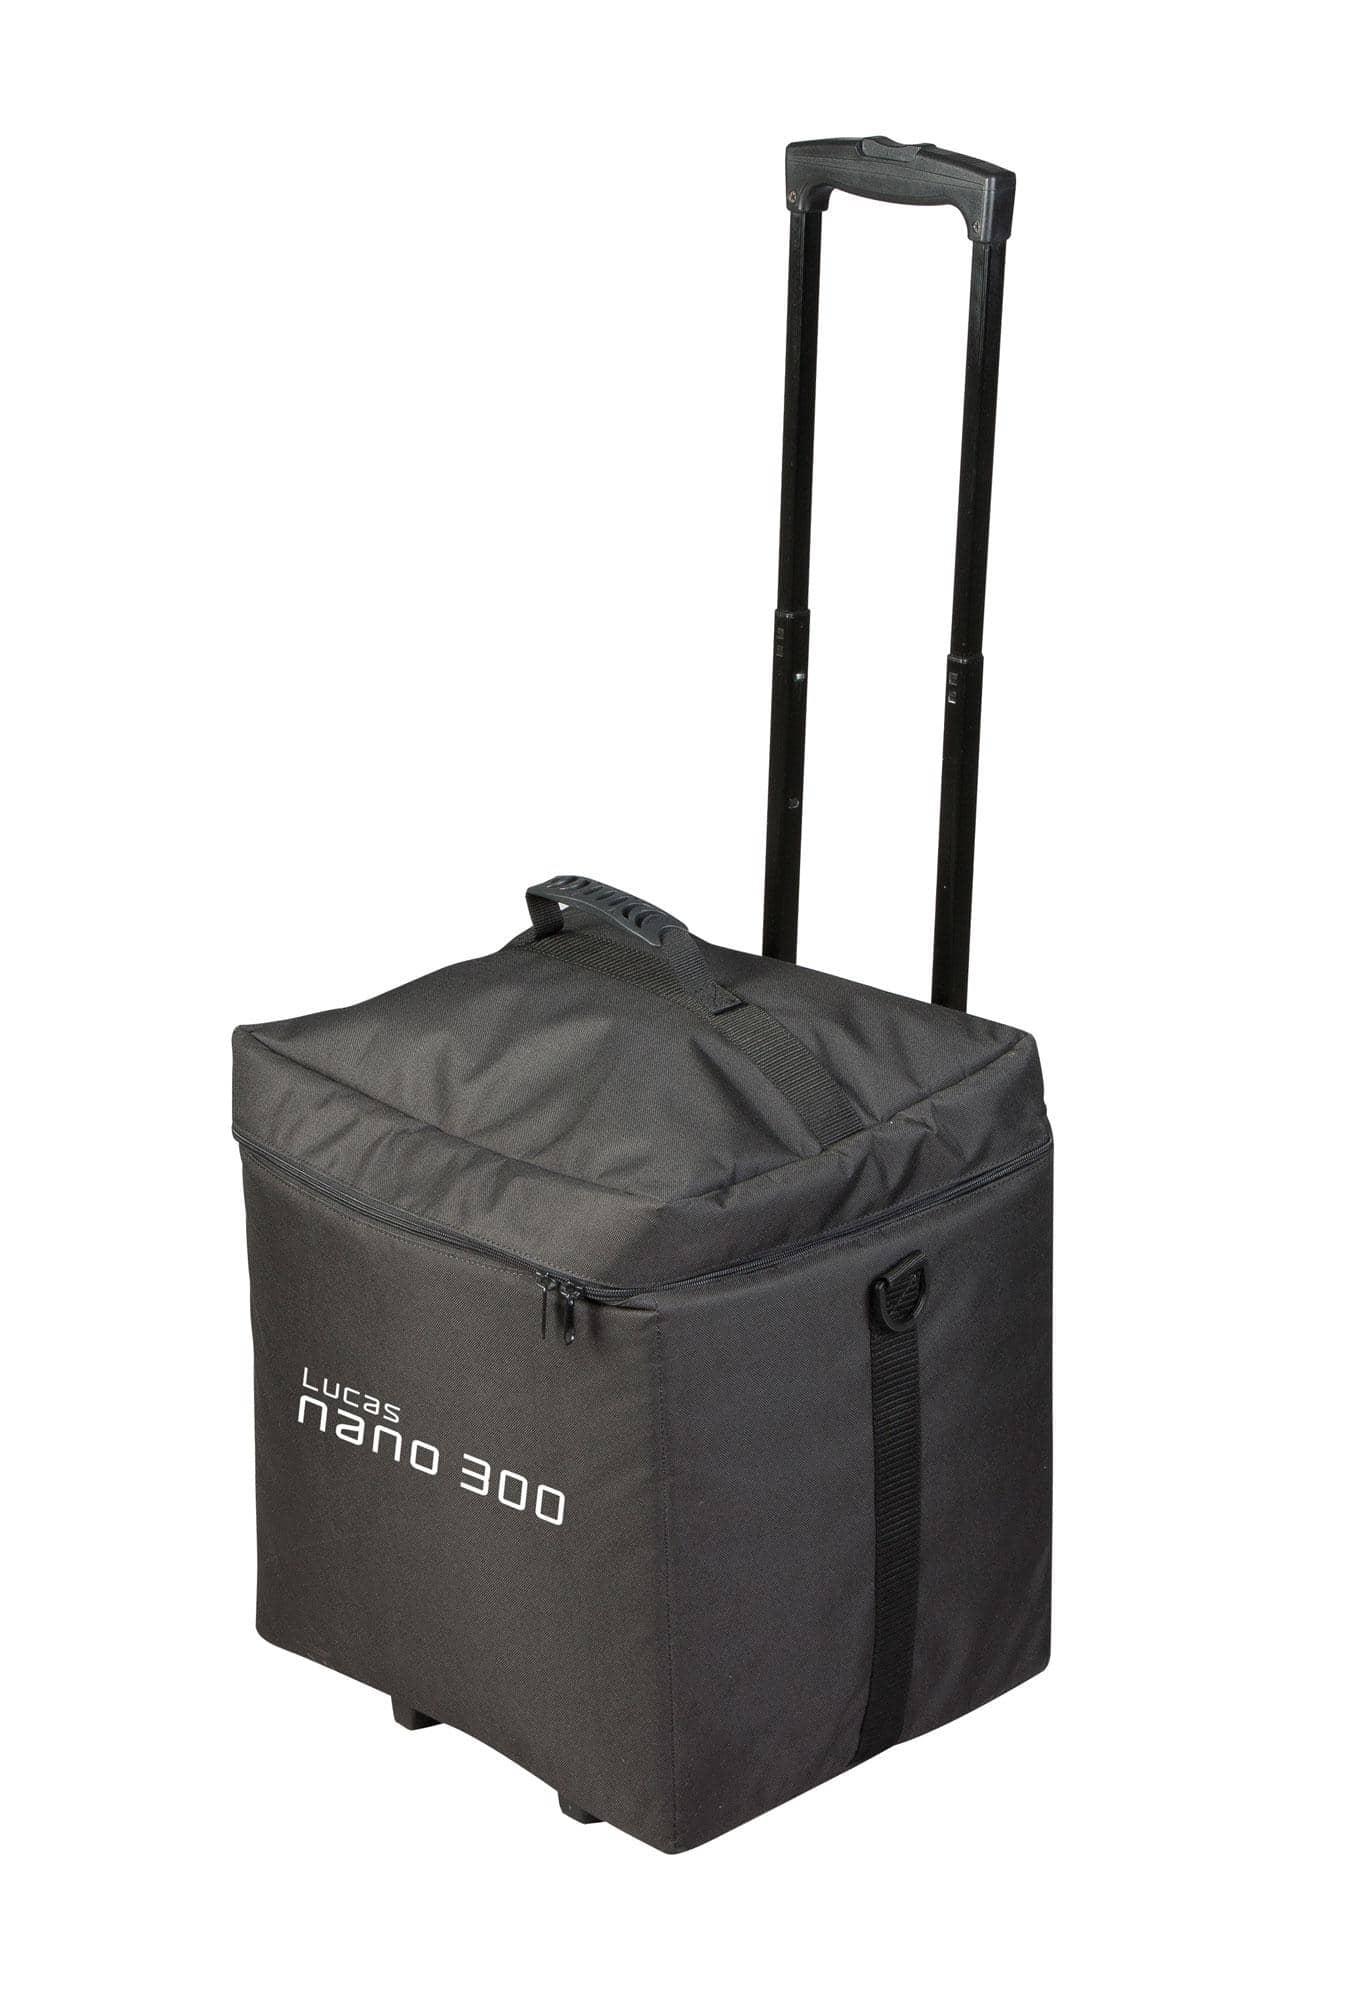 Studiozubehoer - HK Audio Lucas Nano 300 Roller Bag - Onlineshop Musikhaus Kirstein